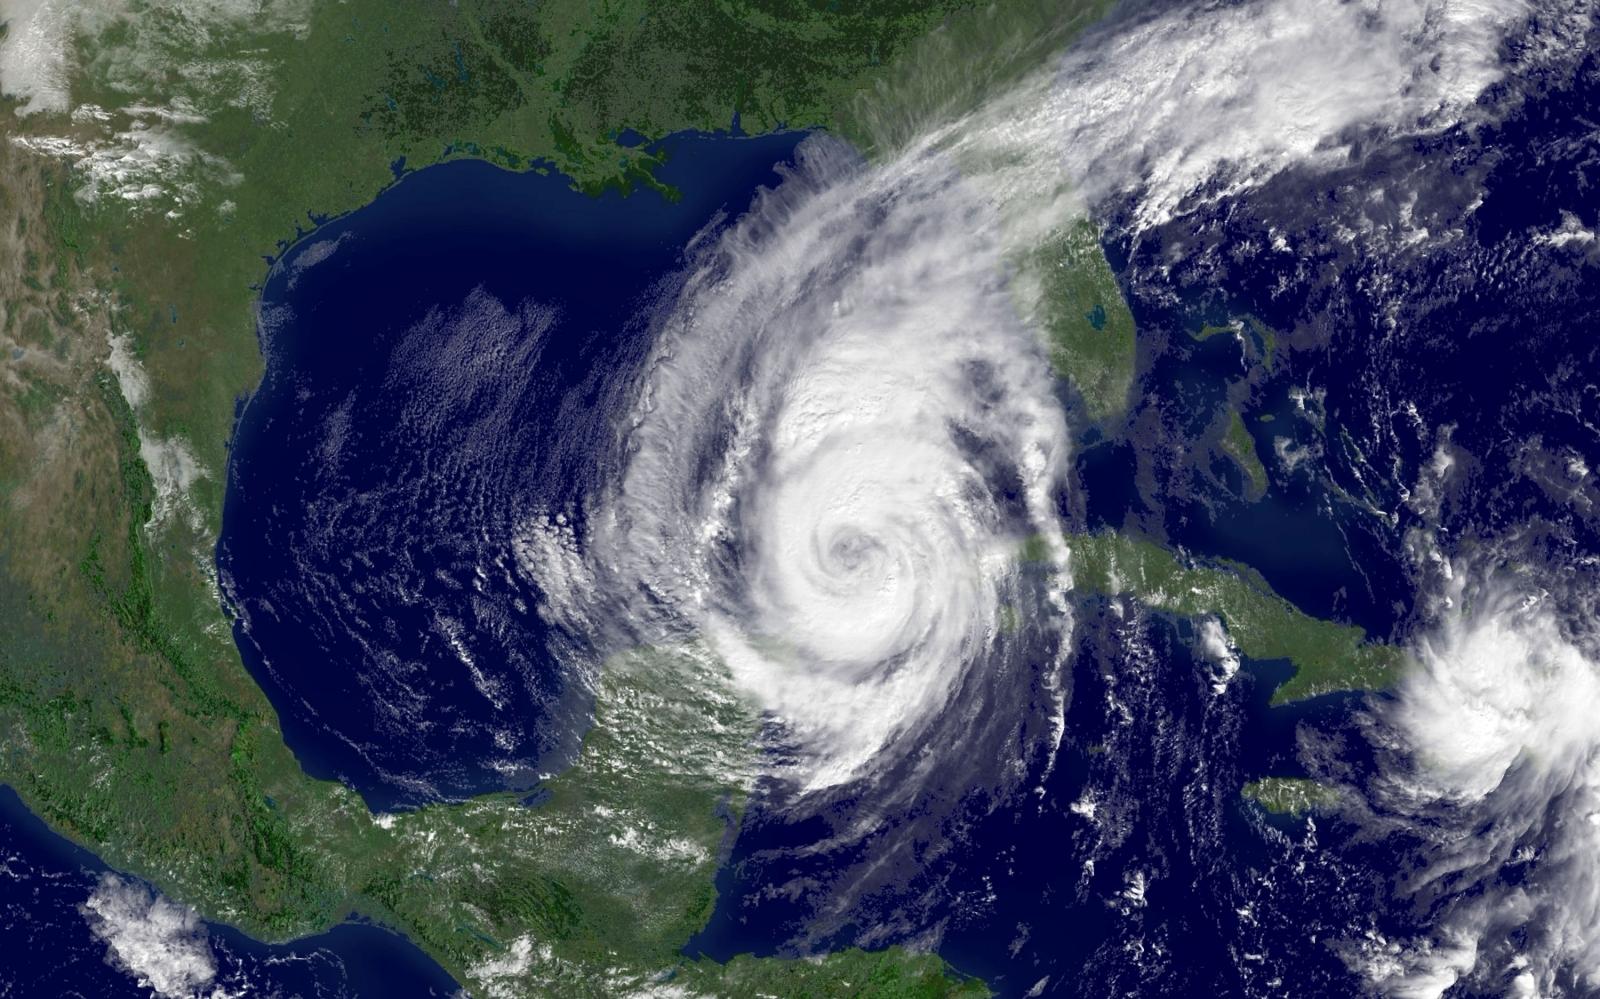 Hurricane Wilma in 2005